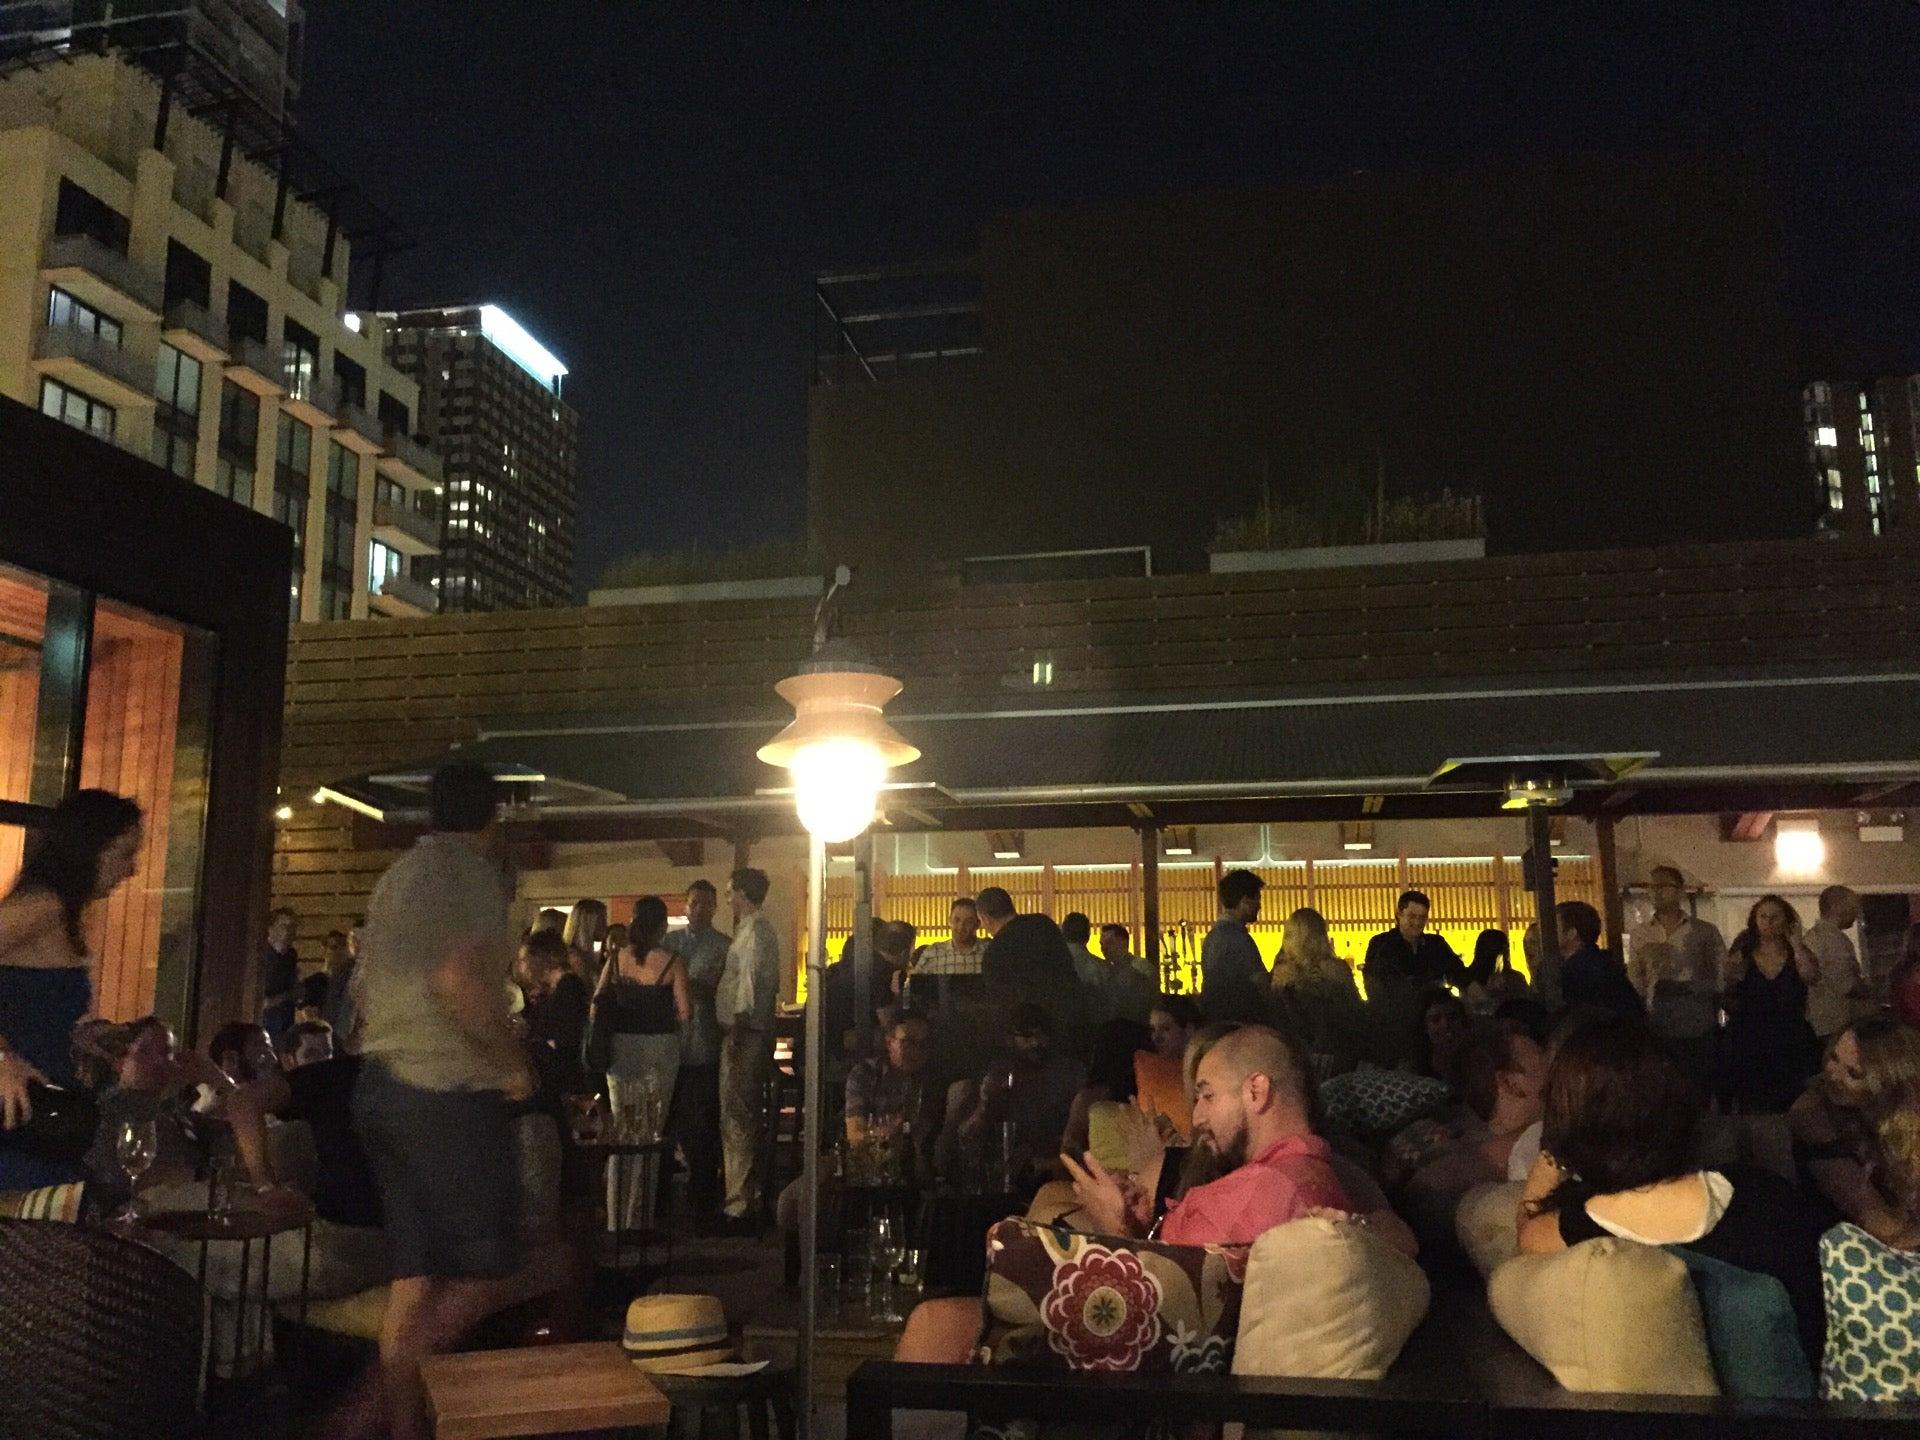 Zed 451, bar, beer, buffet, cocktails, concept, drinks, fusion,brazillian steakhouse,brunch,lounge,prix fixe,restaurant,rooftop,steakhouse,thrillist,timeoutchicago